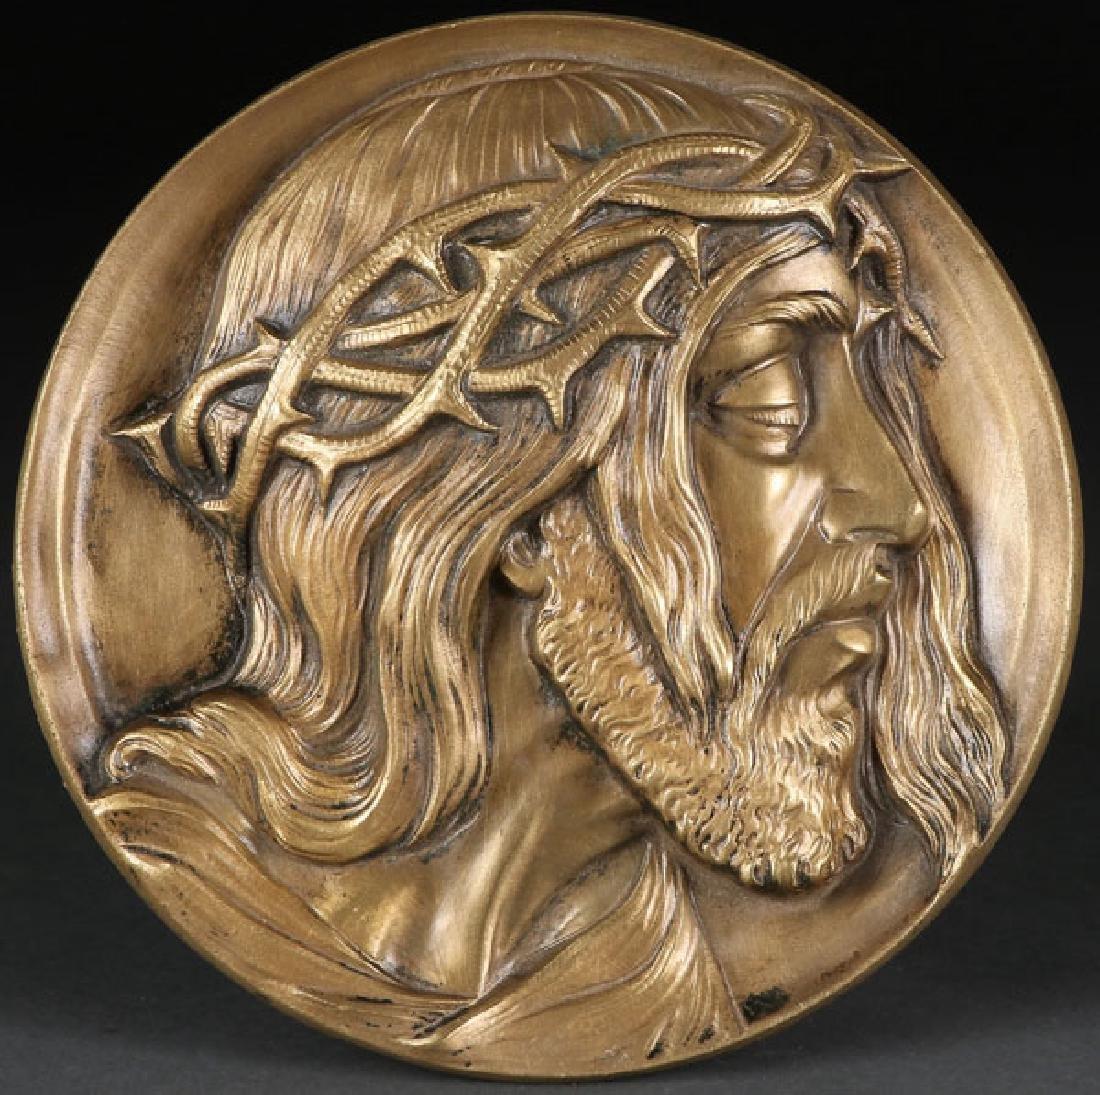 A CAST BRONZE RELIEF PLAQUE OF CHRIST